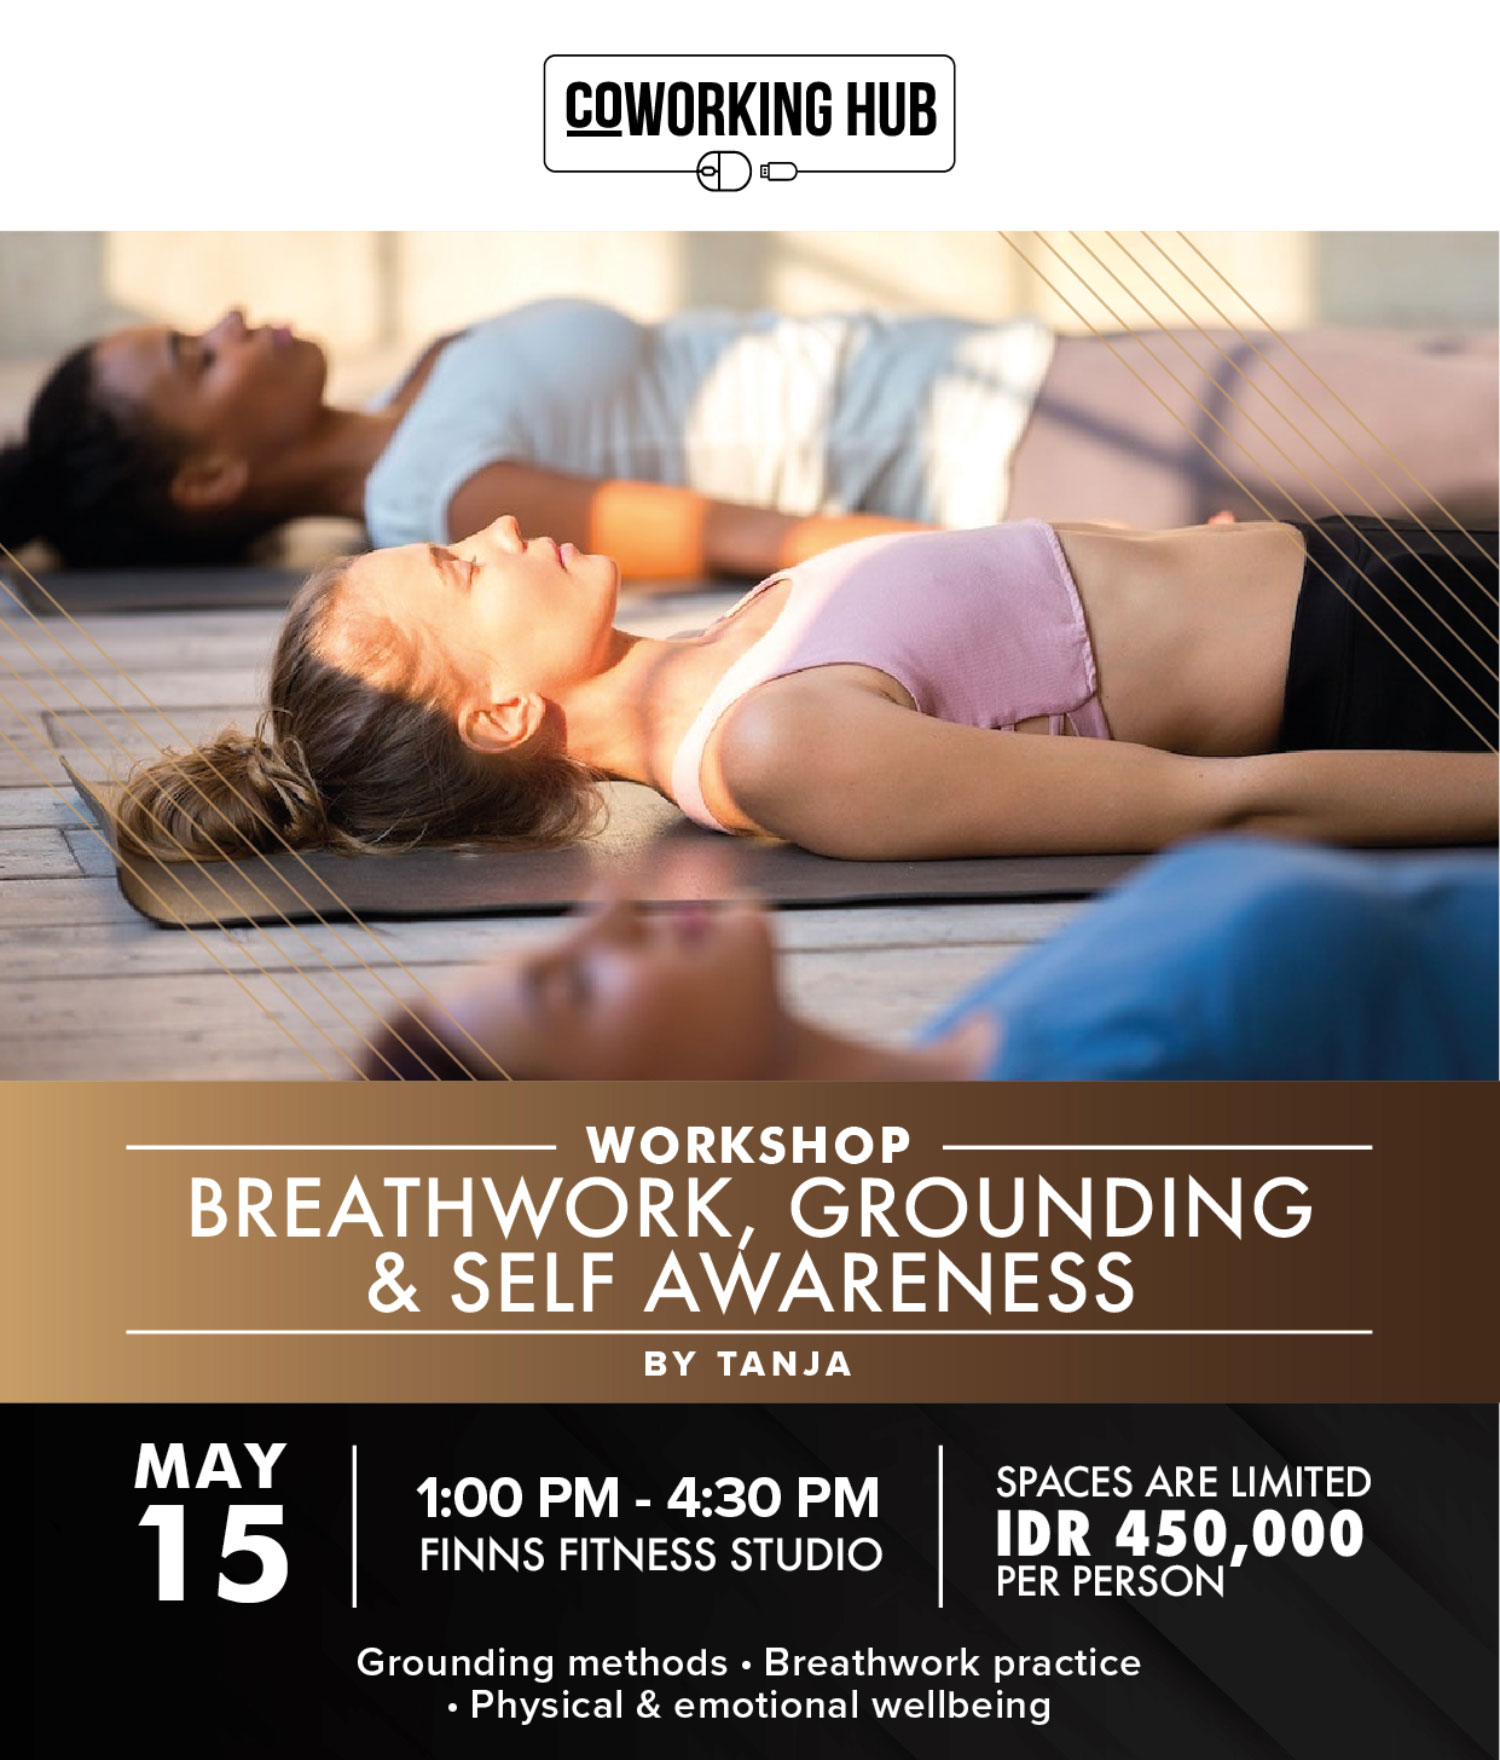 Breathwork, Grounding & Self Awareness